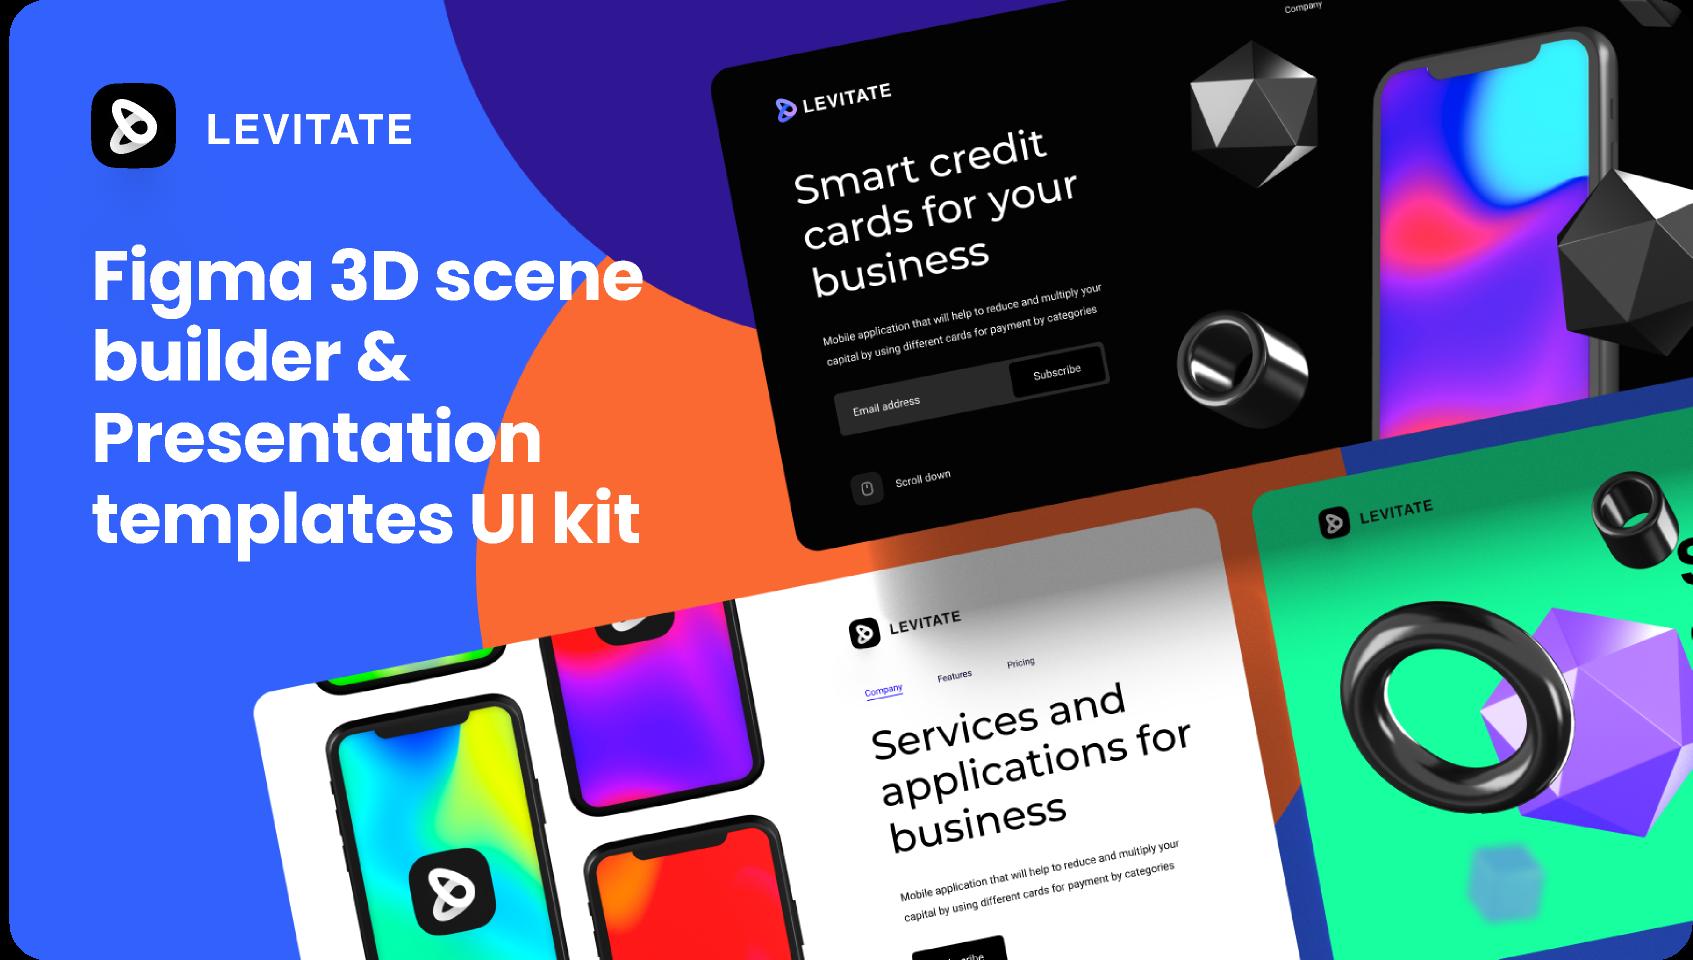 Figma Levitate UI kit for 3D presentations template